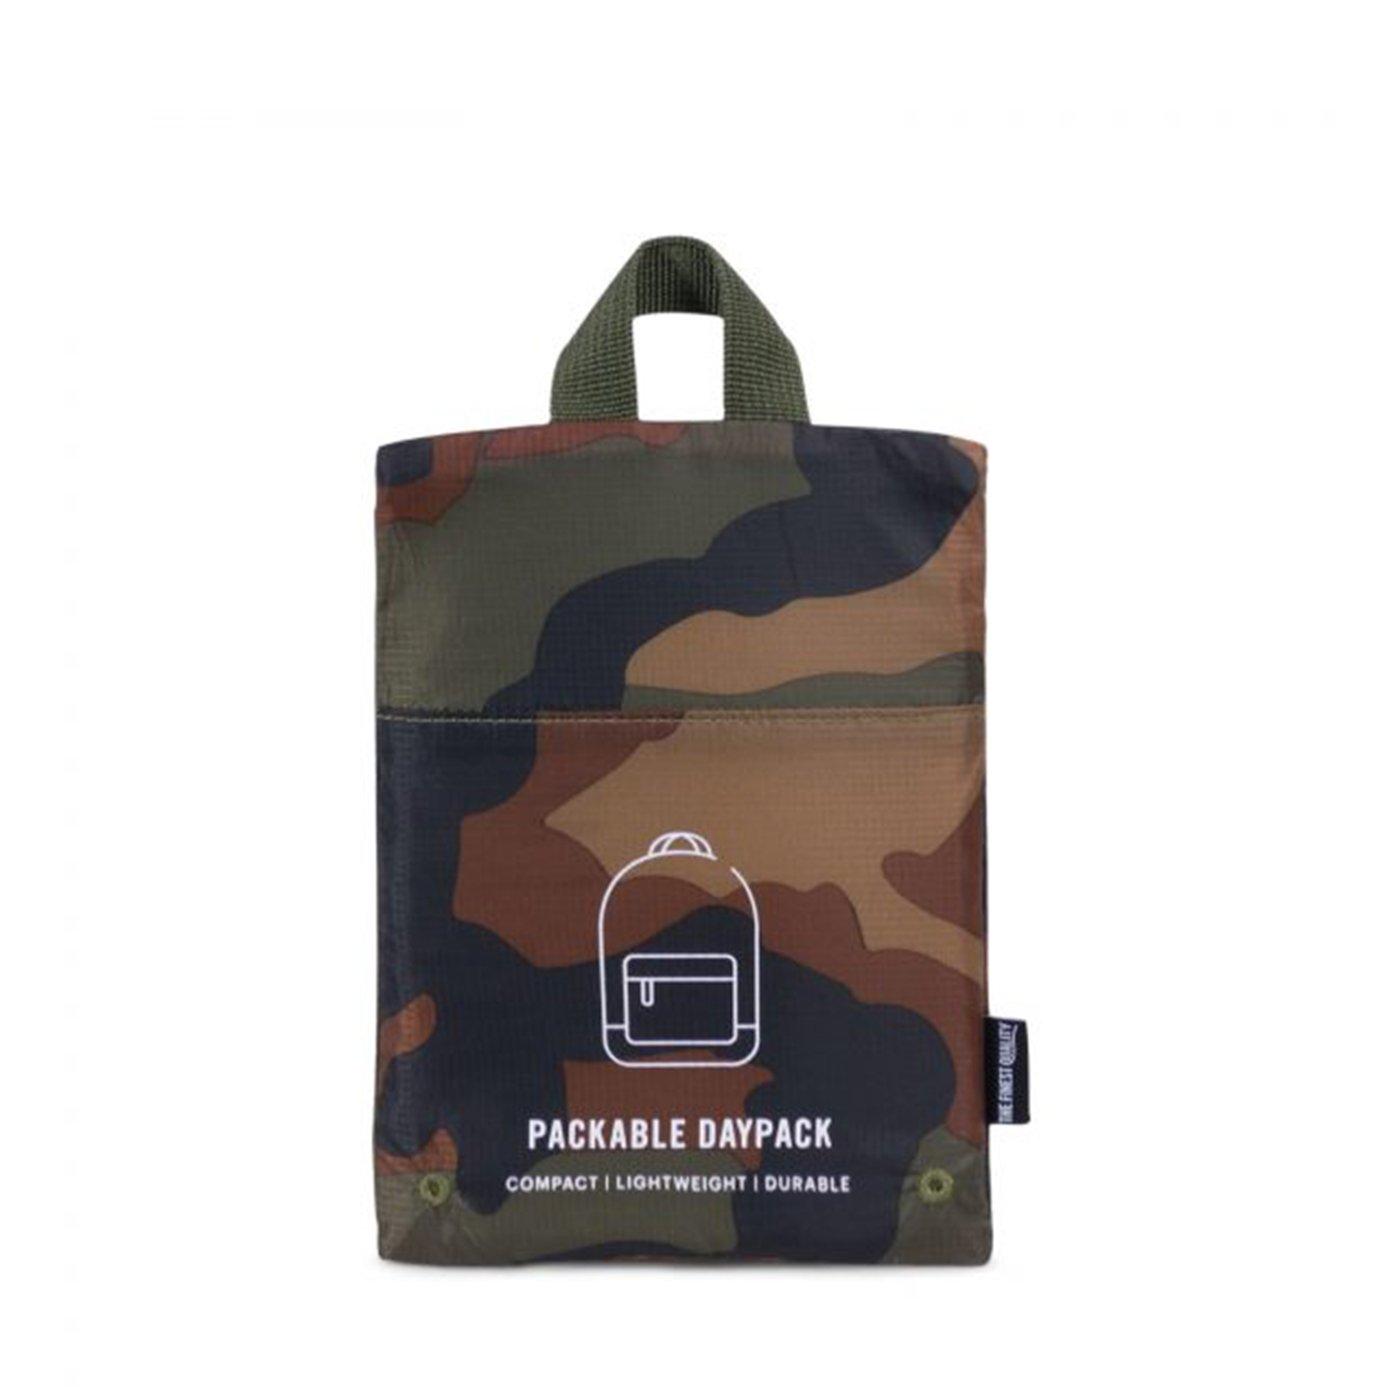 Herschel Packable Daypack Unisex Yeşil Çanta